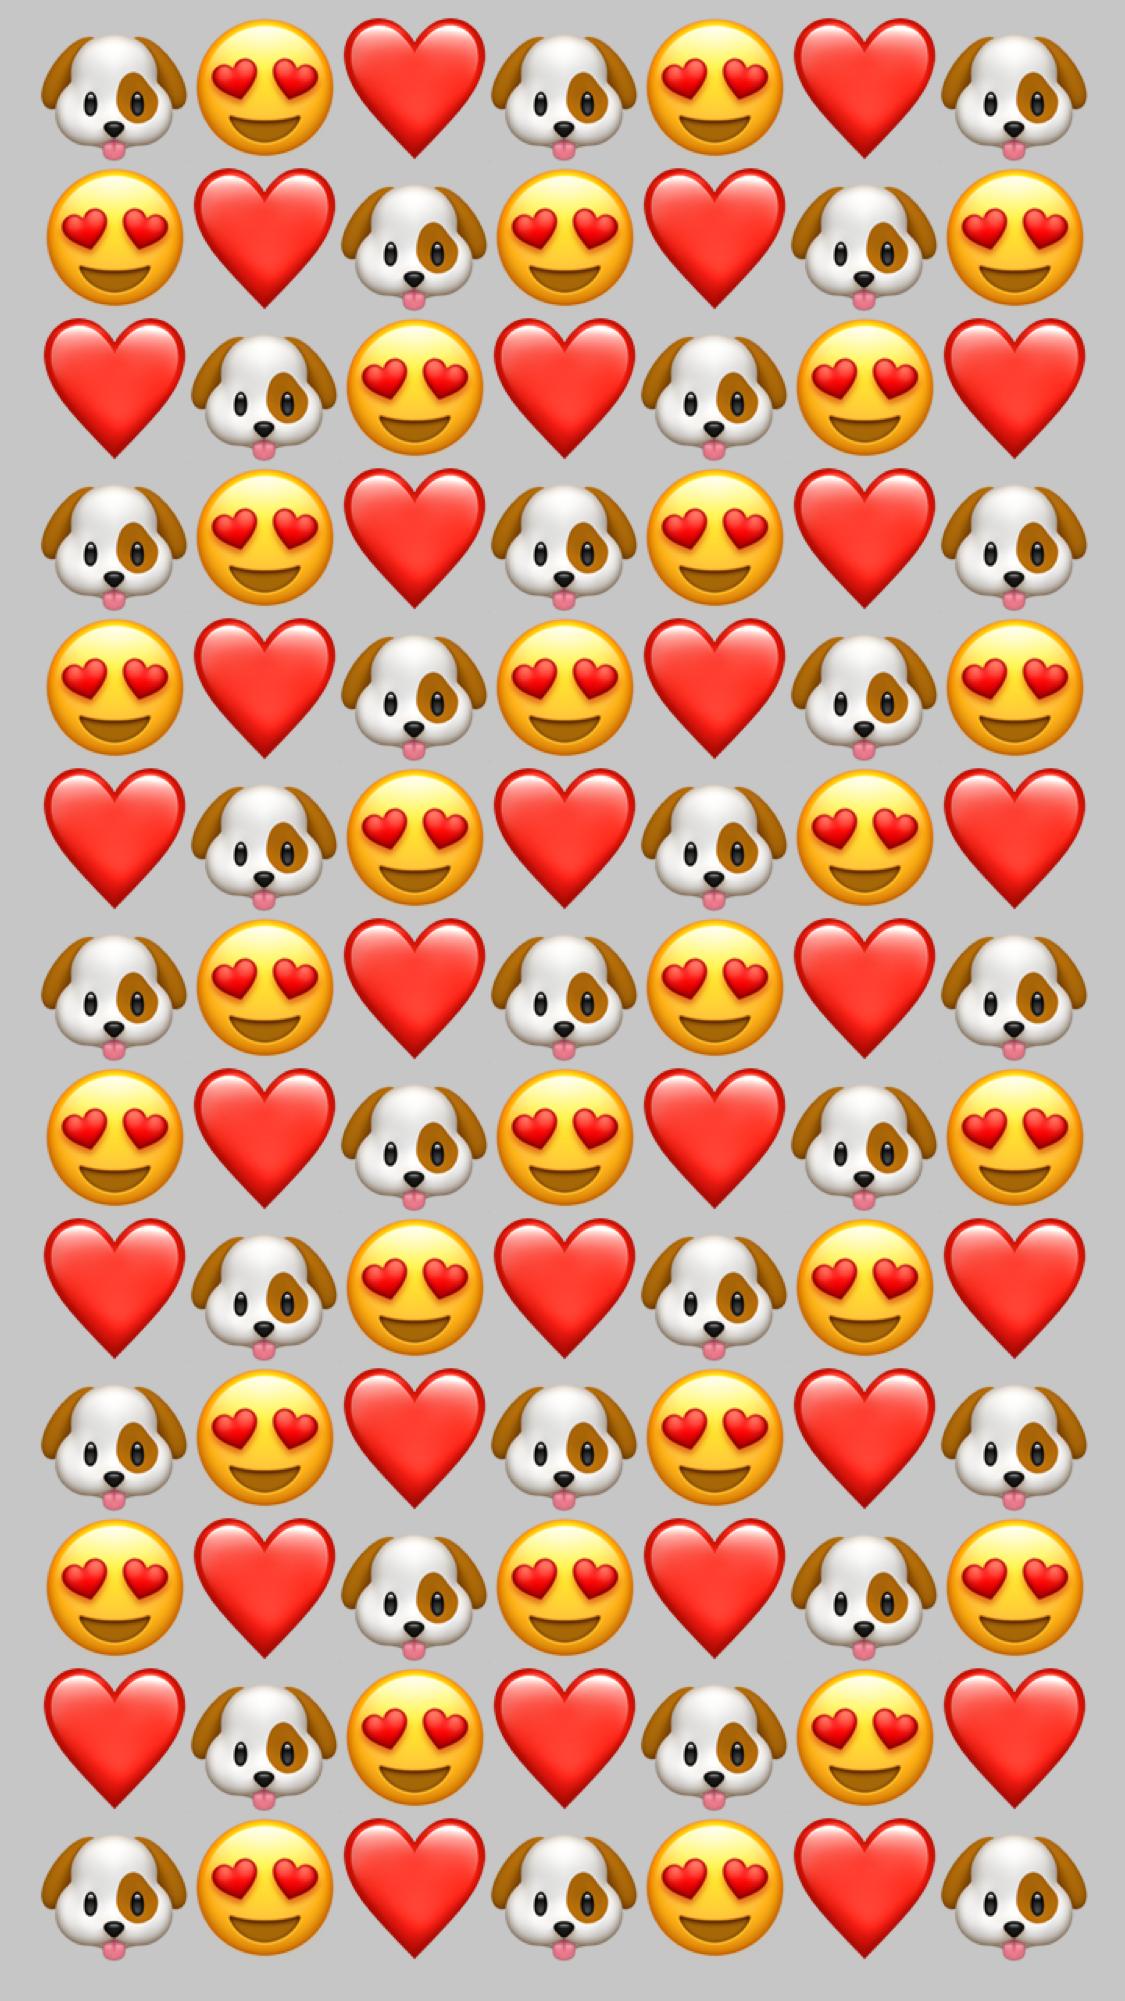 Wallpaper Dog Iphone Love Whatsapp In 2019 Emoji Wallpaper